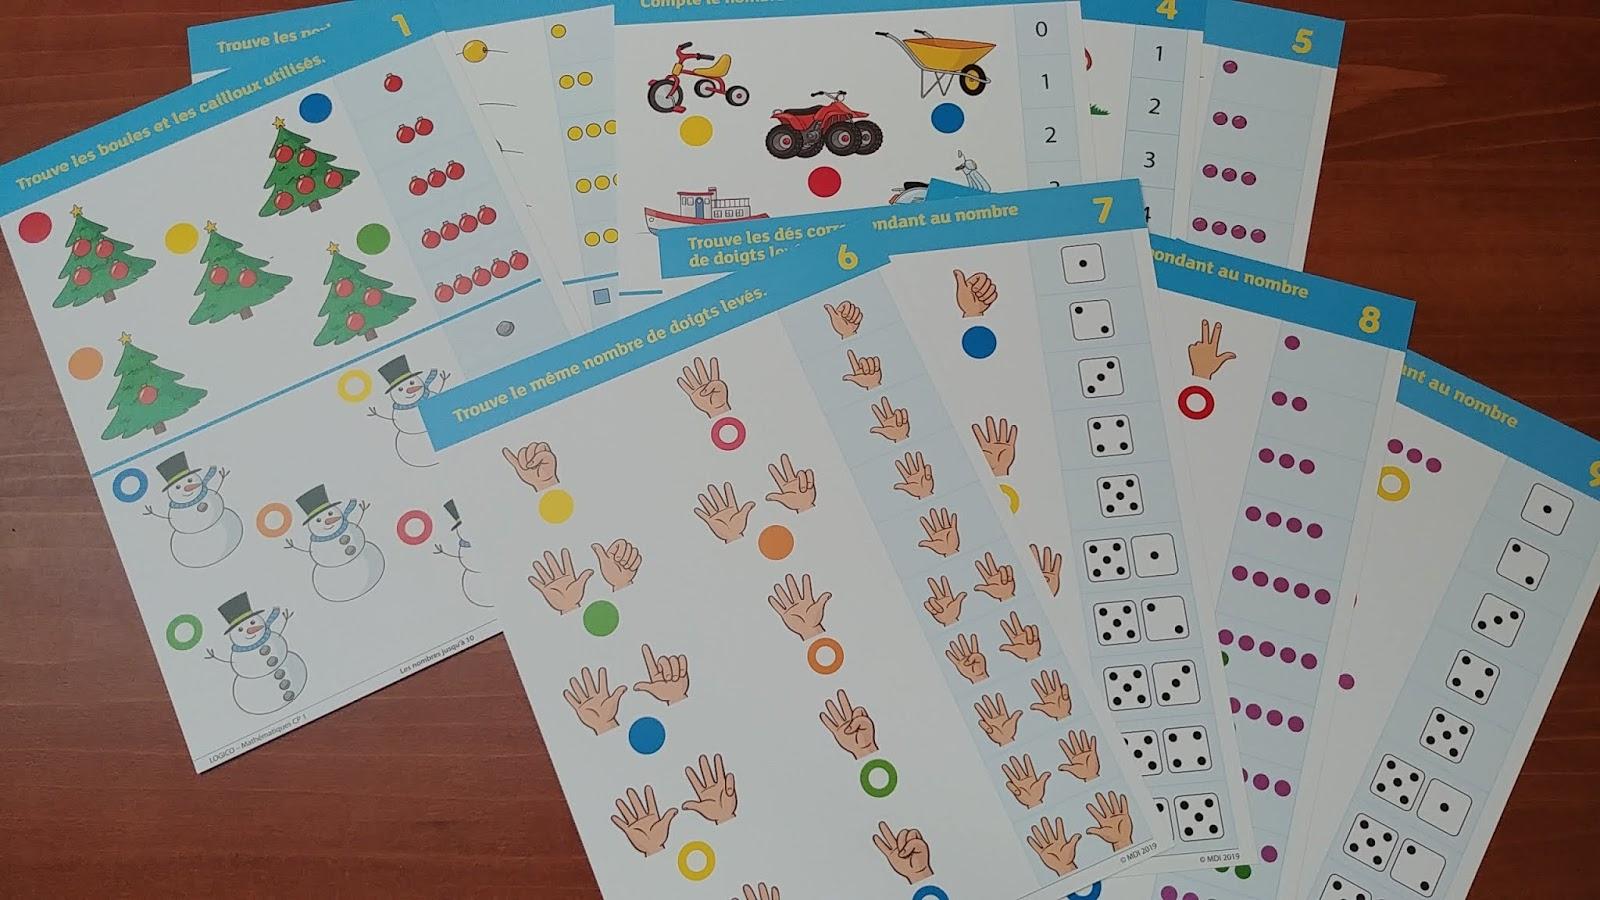 Jeux Grande Section Maternelle Gratuit En Ligne - Primanyc encequiconcerne Jeux Maternelle En Ligne